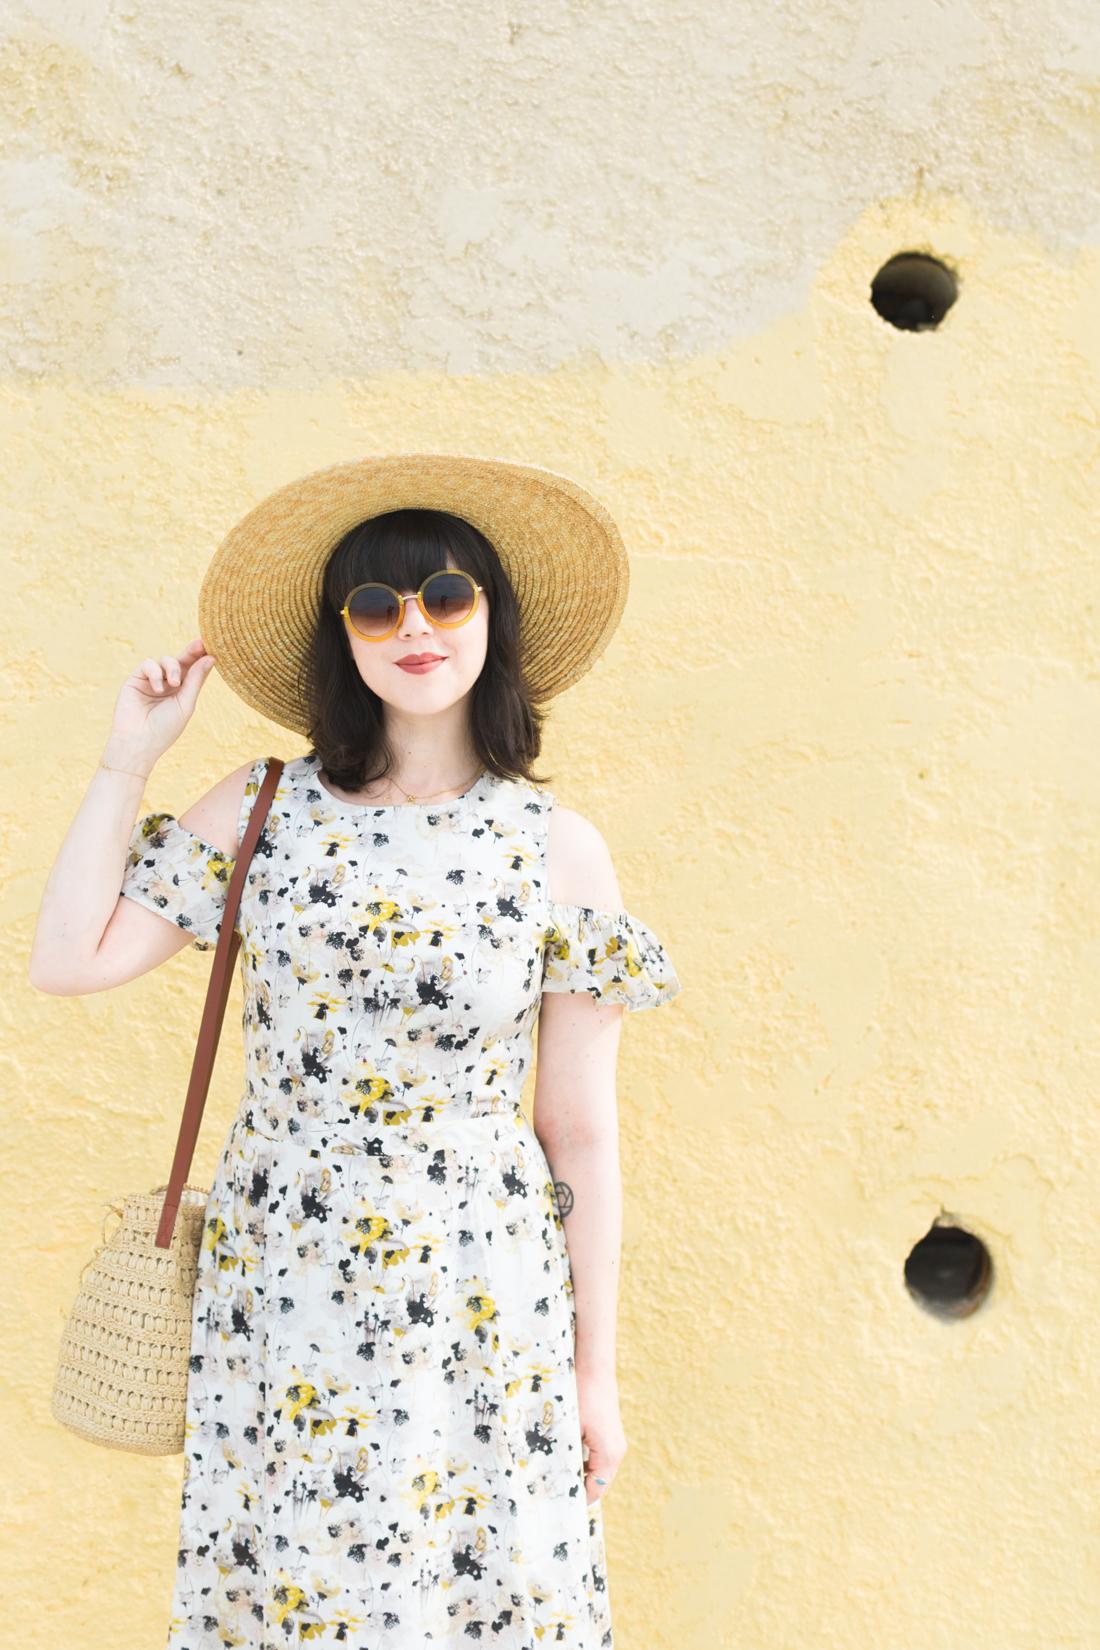 yellow_dress_flowers_kelly_love_youngbritishdesigners_copyright_Pauline_Privez_paulinefashionblog_com-5